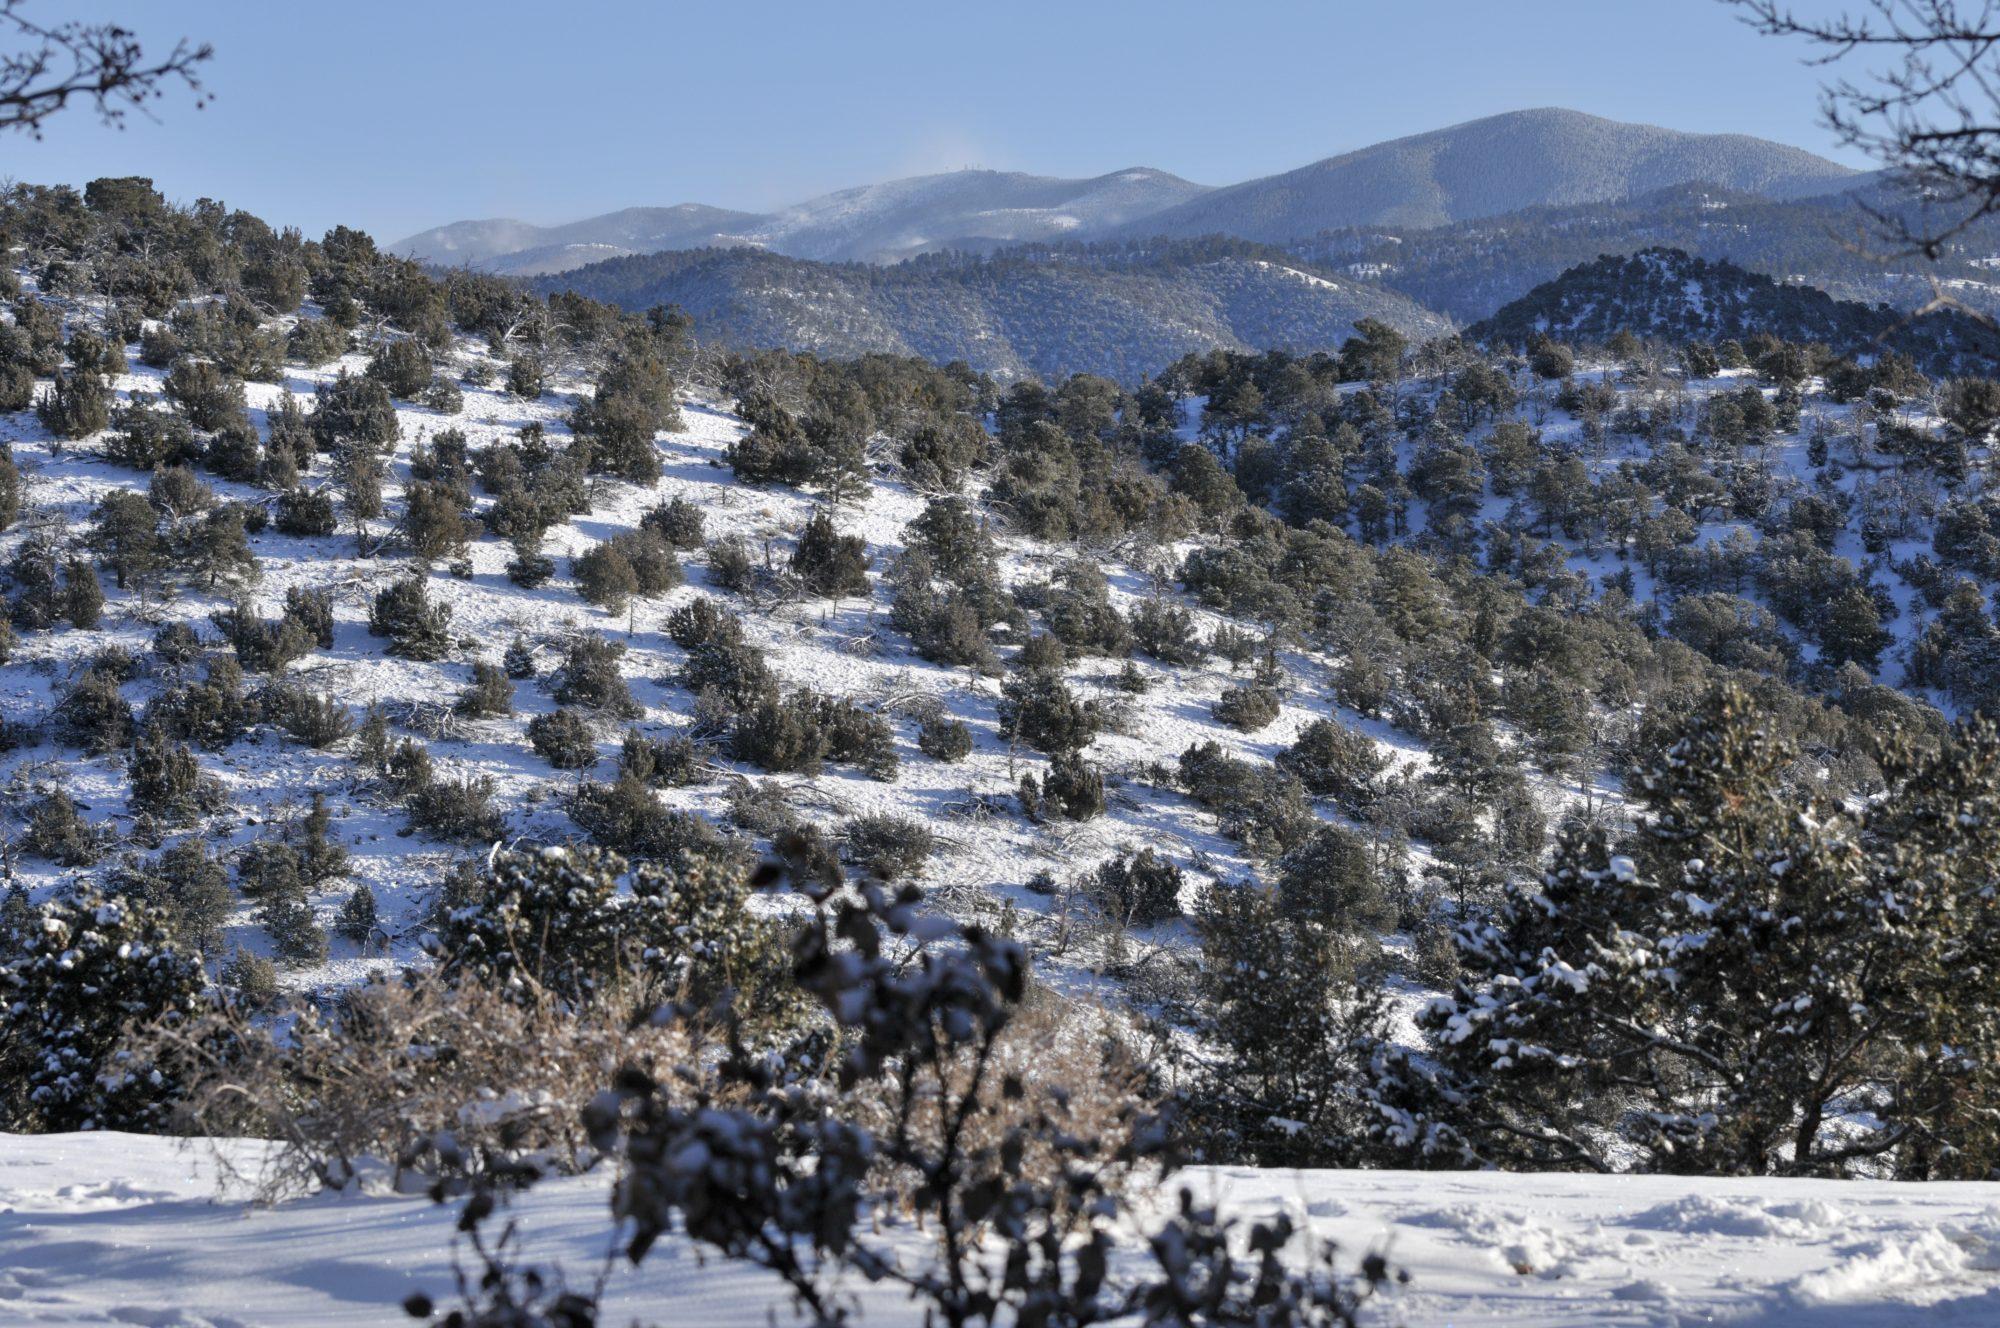 5 SHERWOOD SNOW VIEW LOOKING EAST